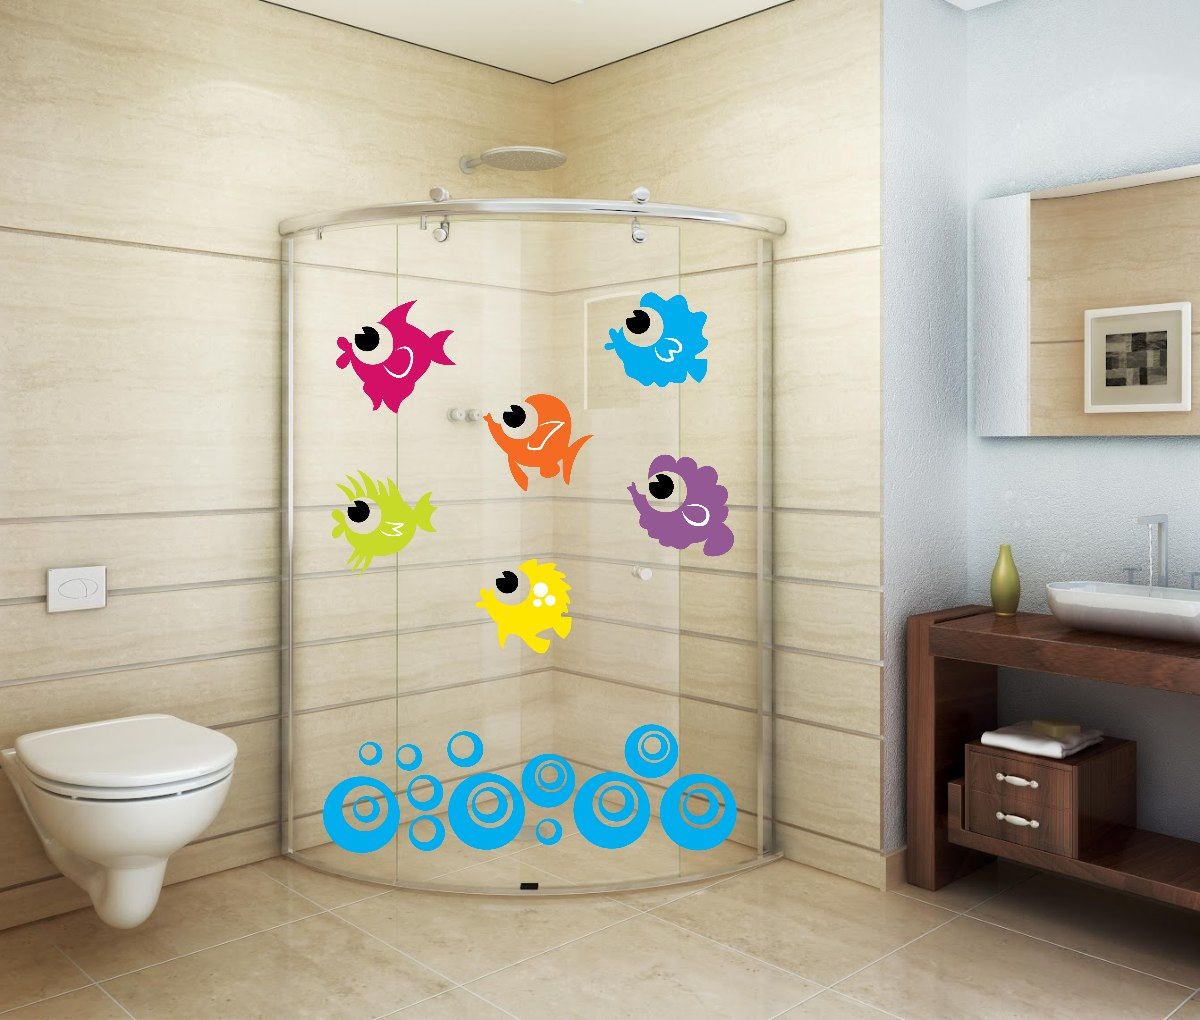 Adesivo Decorativo Parede Banheiro Porta Box Bolha Peixe R$ 24 99 no  #0991C2 1200x1020 Adesivo Box Banheiro Jateado